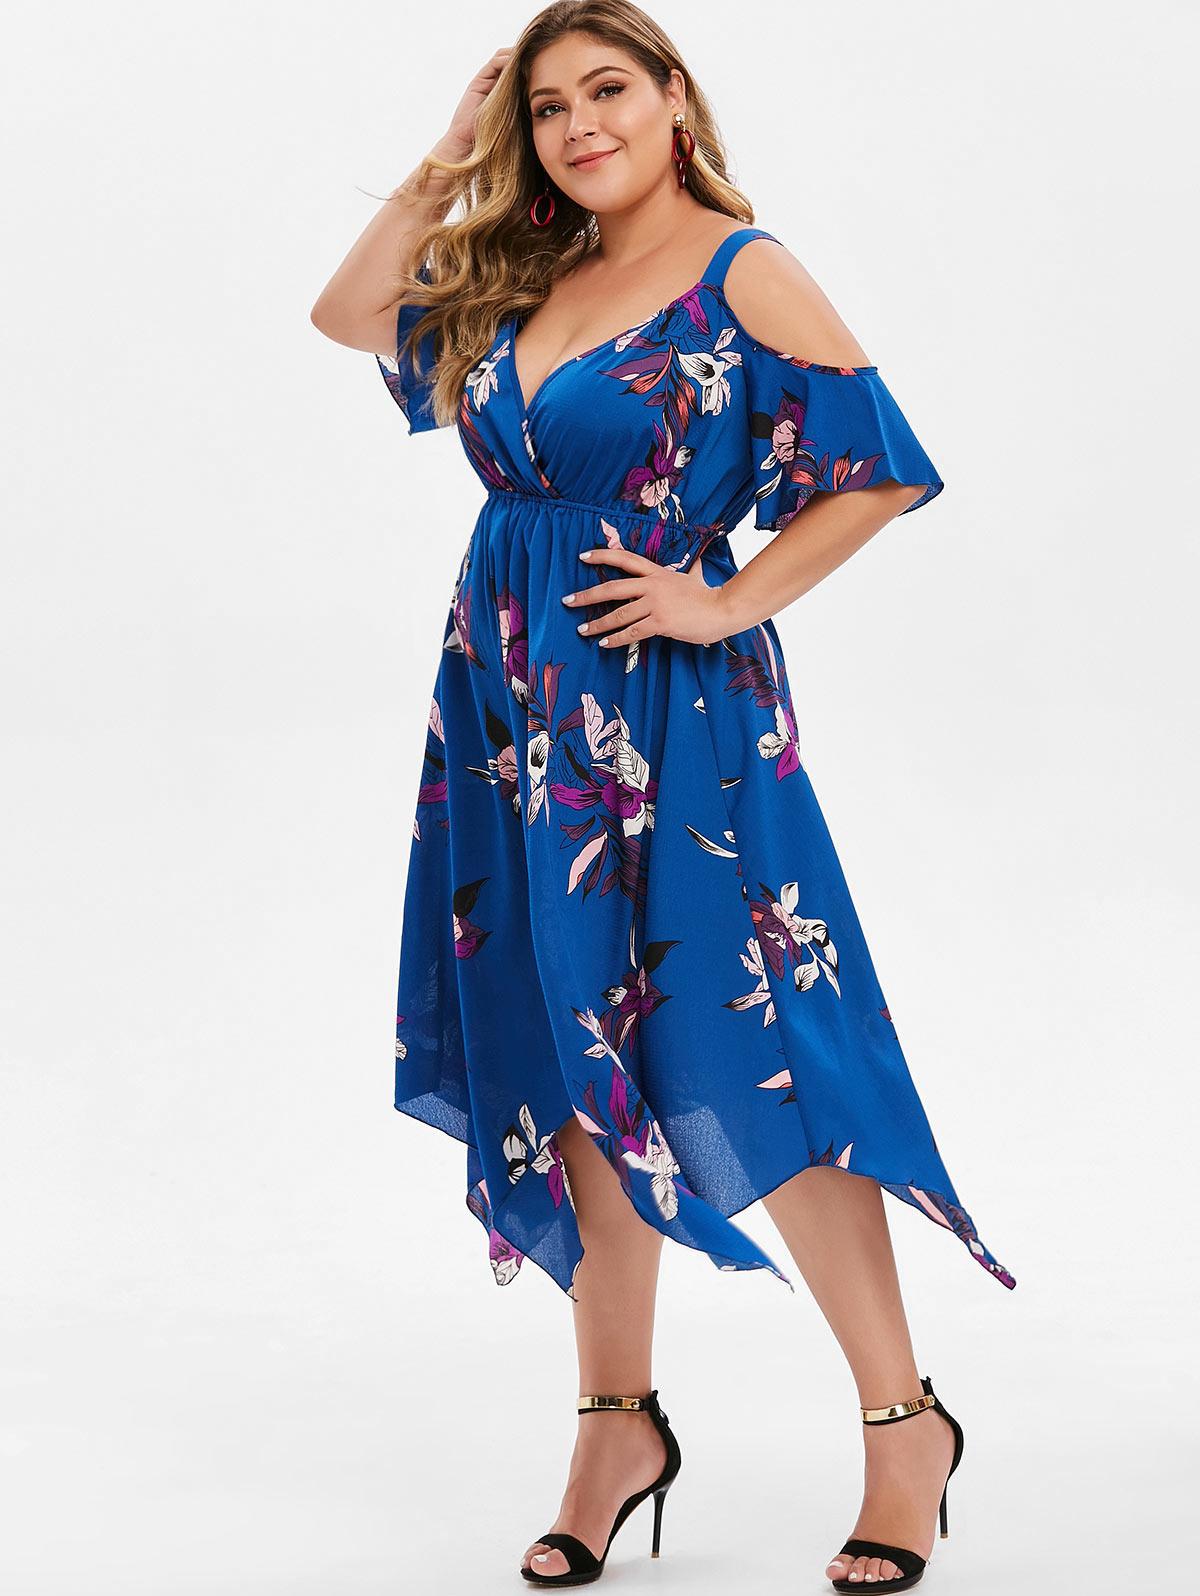 a2ff40c07b6bf Wipalo 2017 Summer Plus Size 5XL Two Tone Handkerchief Slip Dress ...